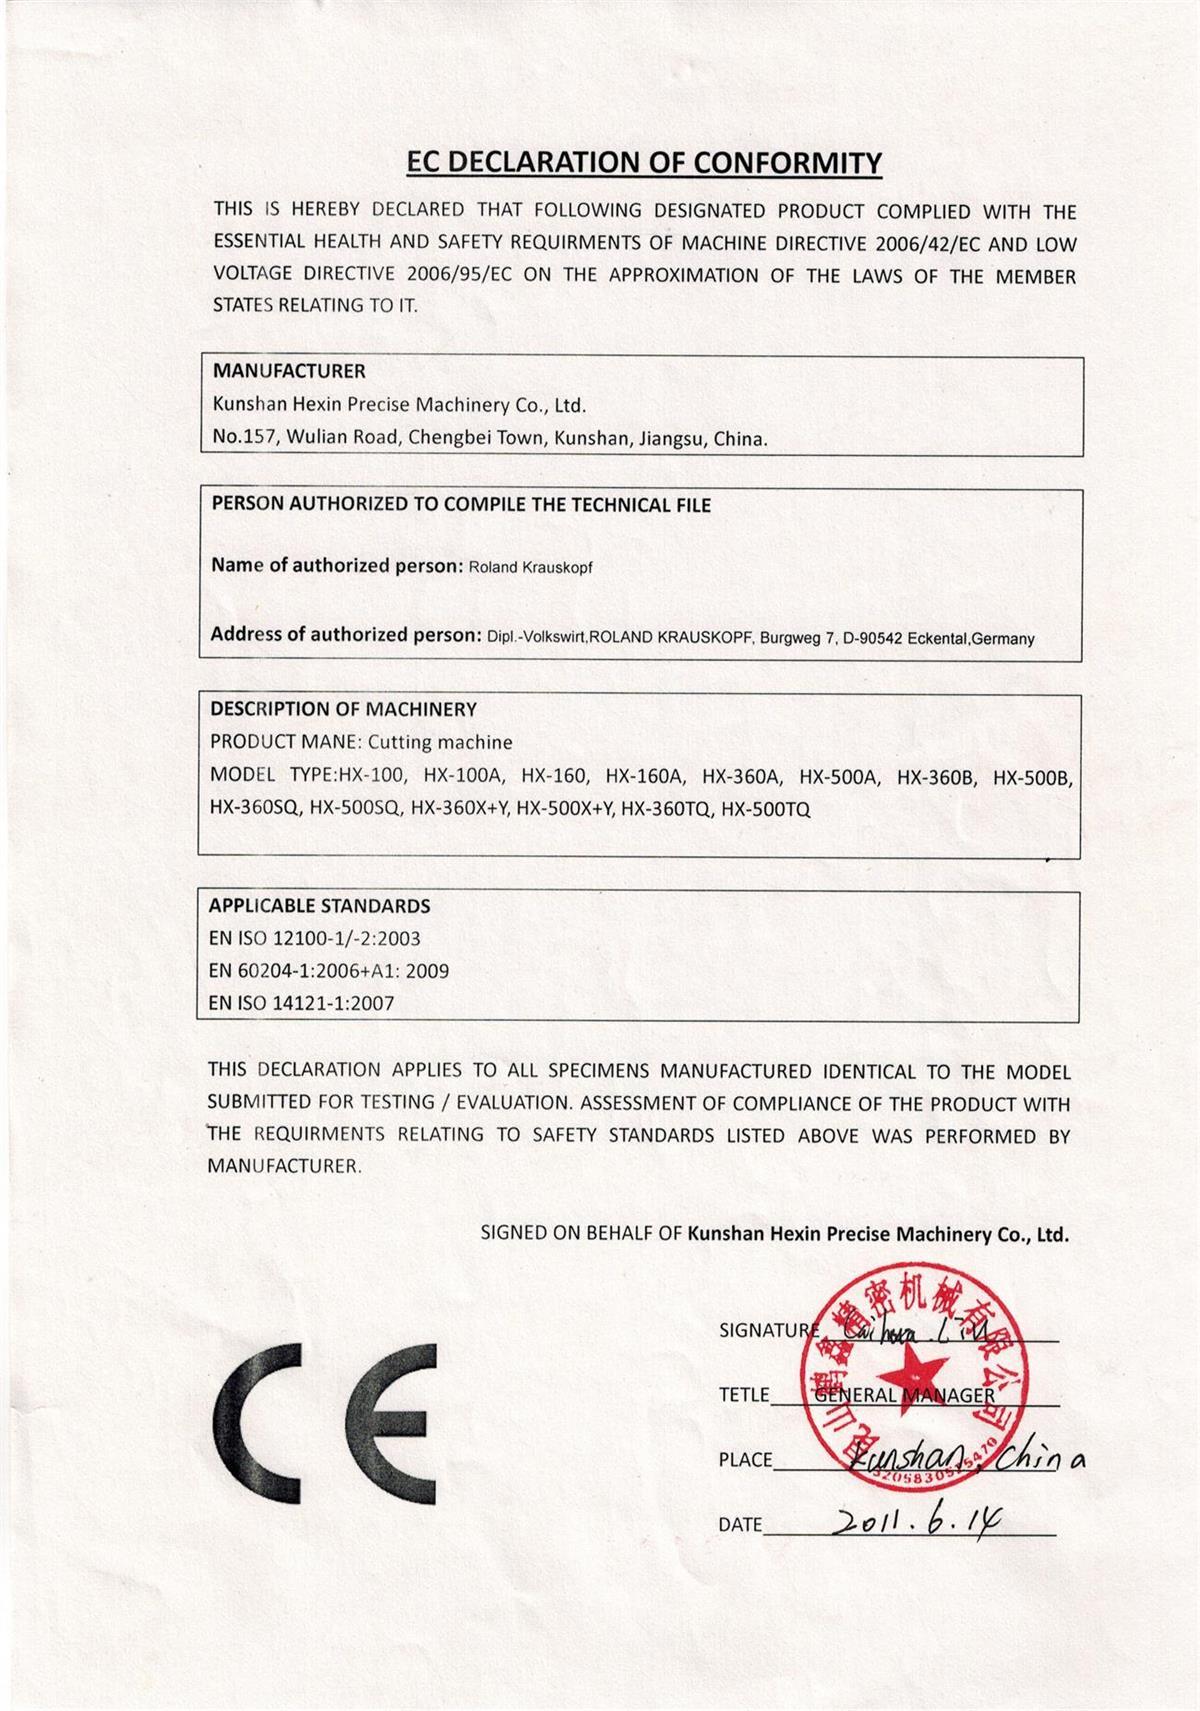 EC Declaration Certificate